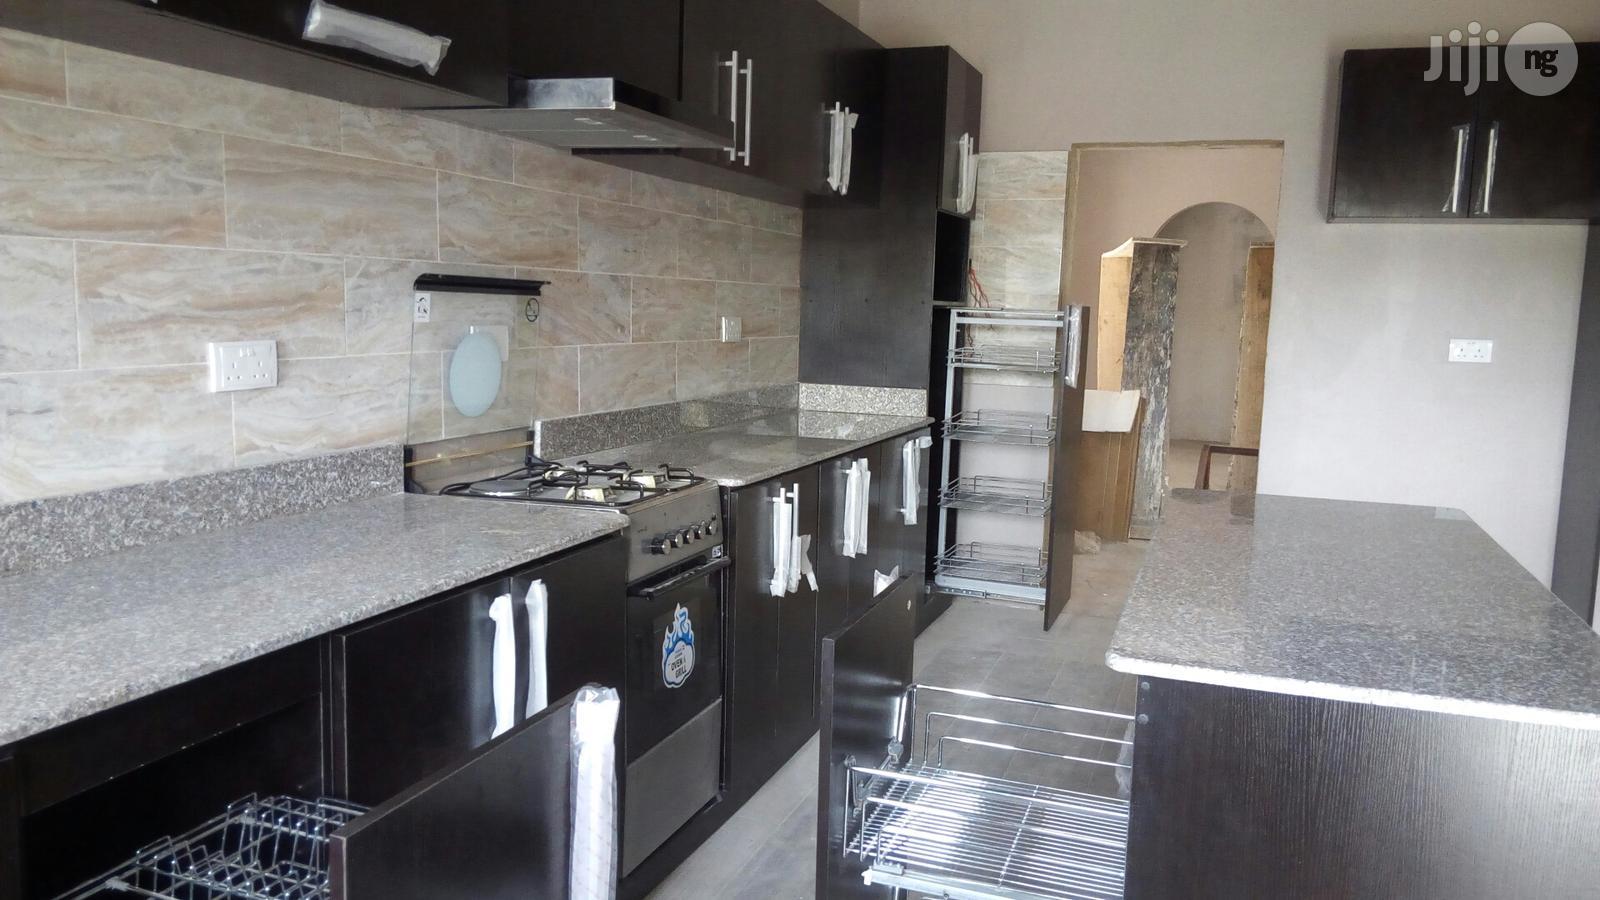 Kitchen Cabinets Black | Furniture for sale in Isolo, Lagos State, Nigeria